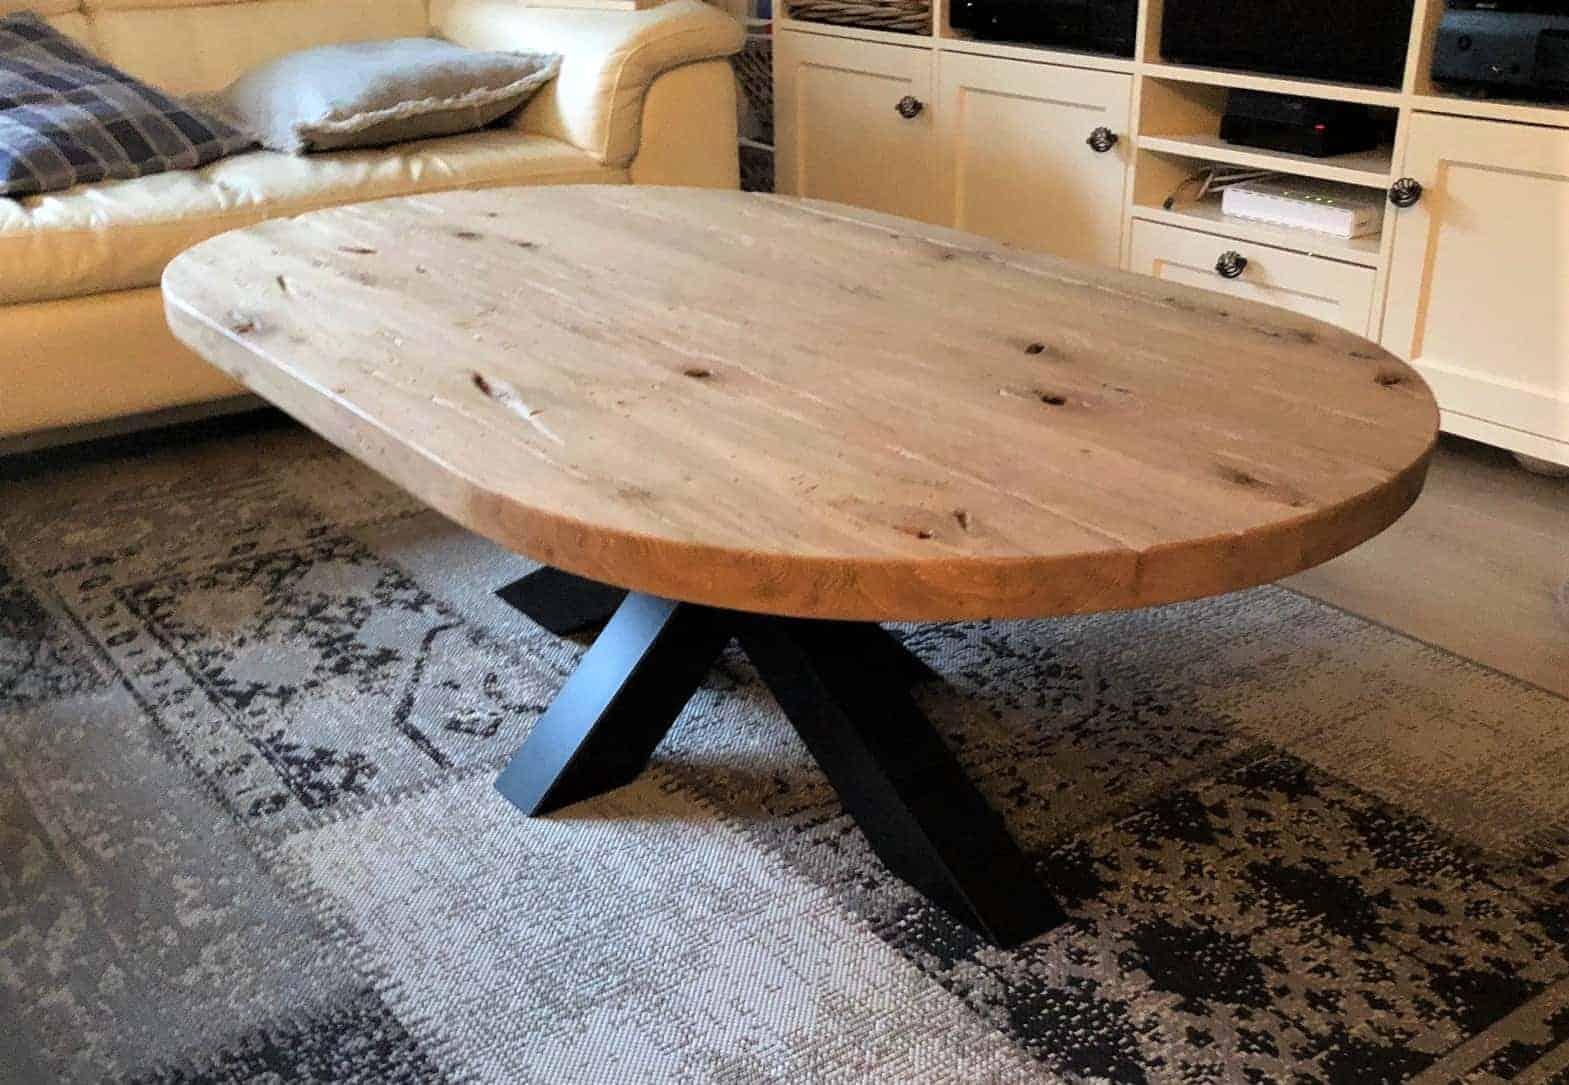 Recht ovale salontafel van geschaafd oud eiken